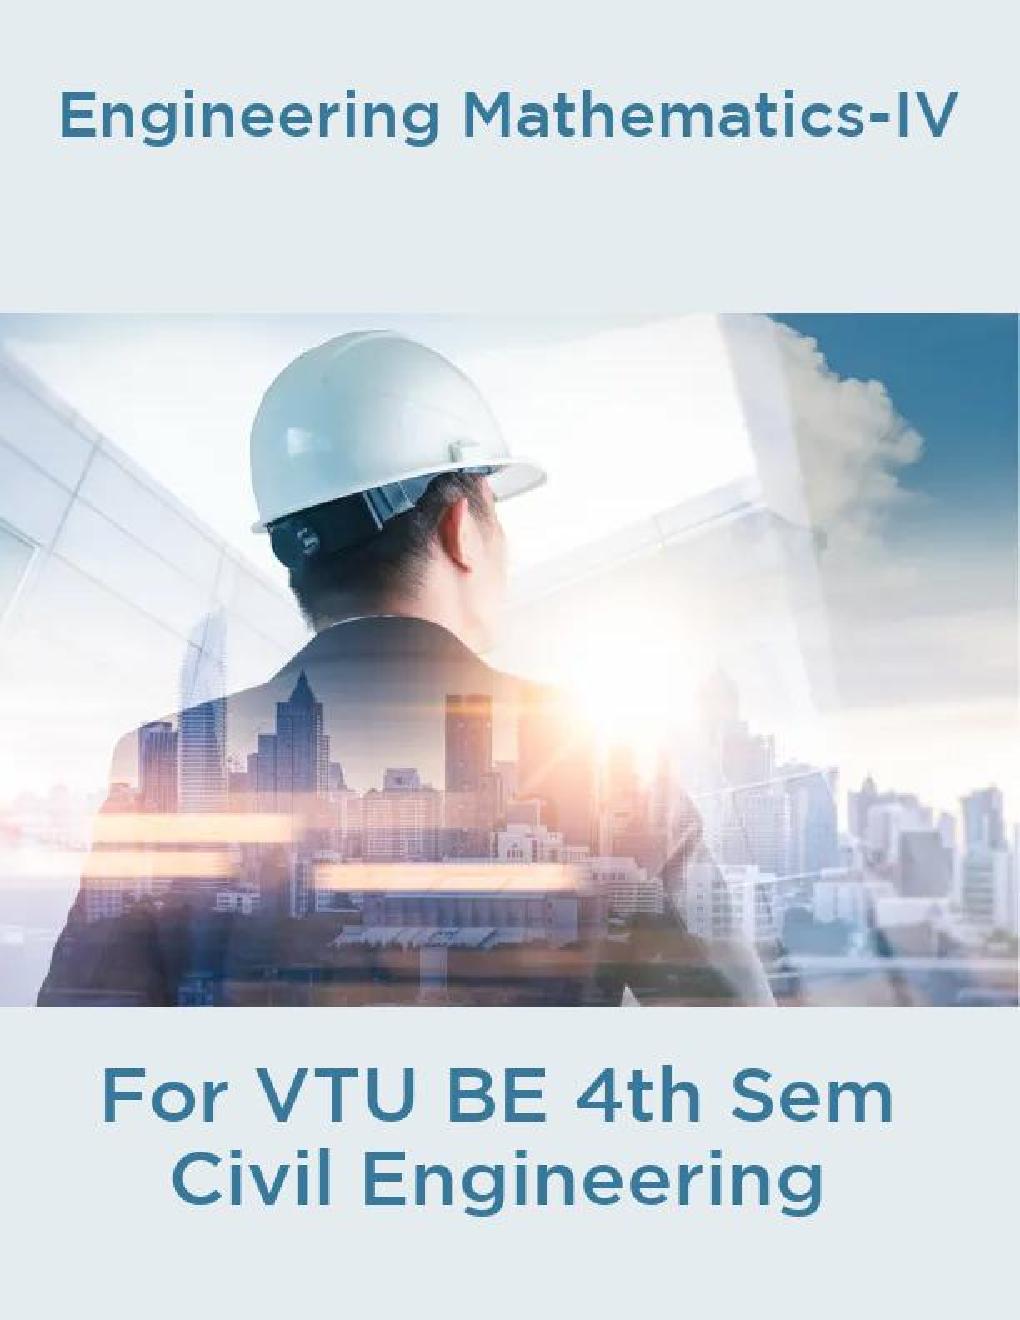 Engineering Mathematics-IV  For VTU BE 4th Sem Civil Engineering - Page 1